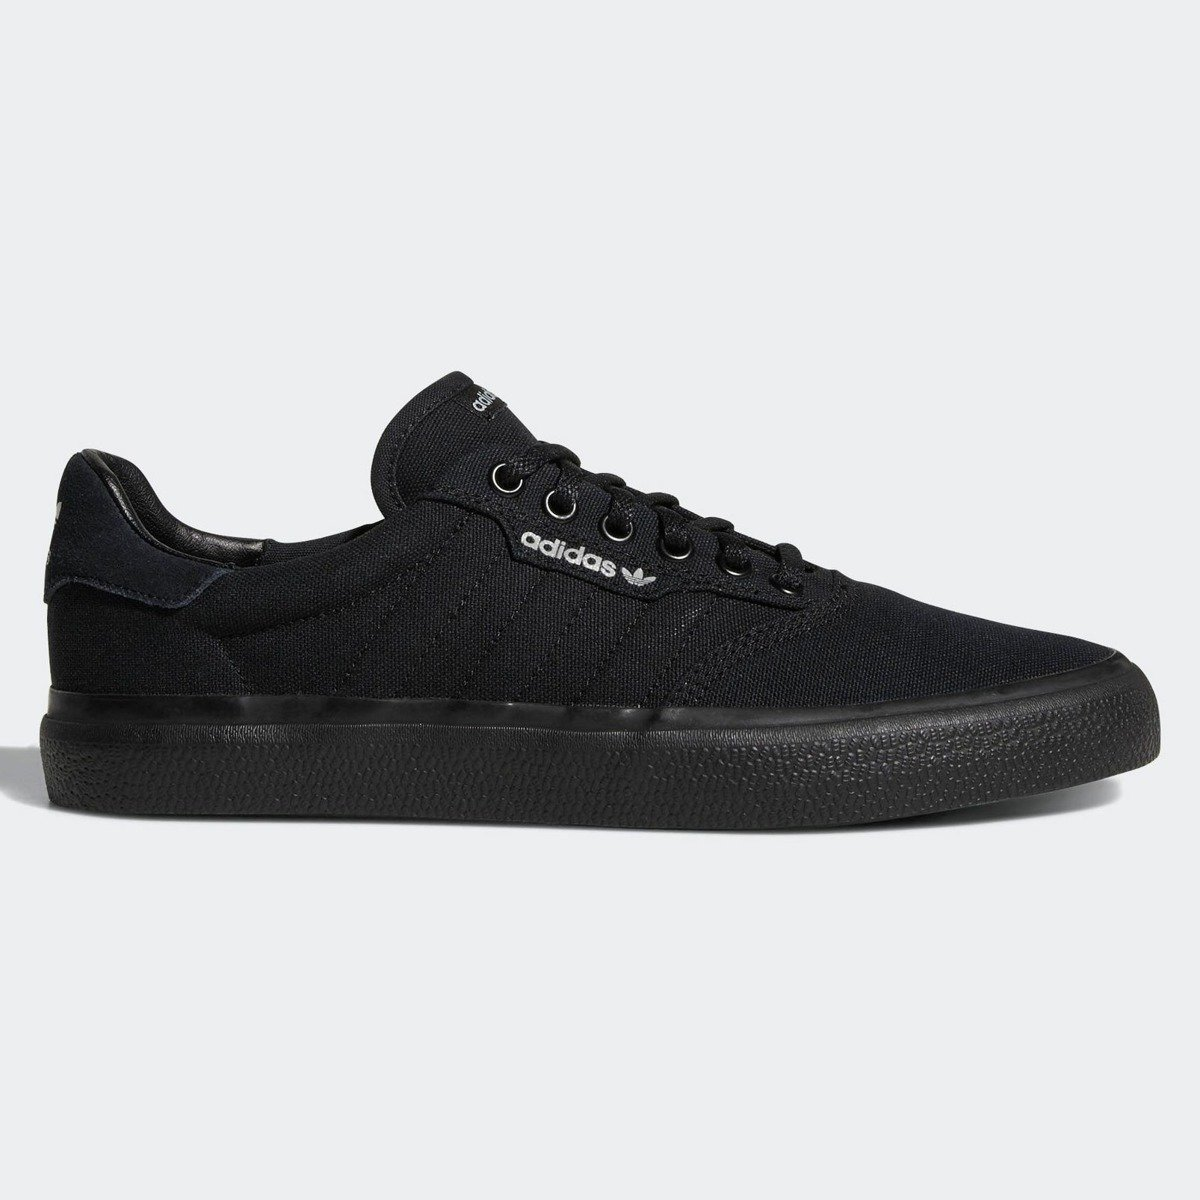 finest selection 2fb75 b2863 Miniramp Skateshop buty adidas 3mc